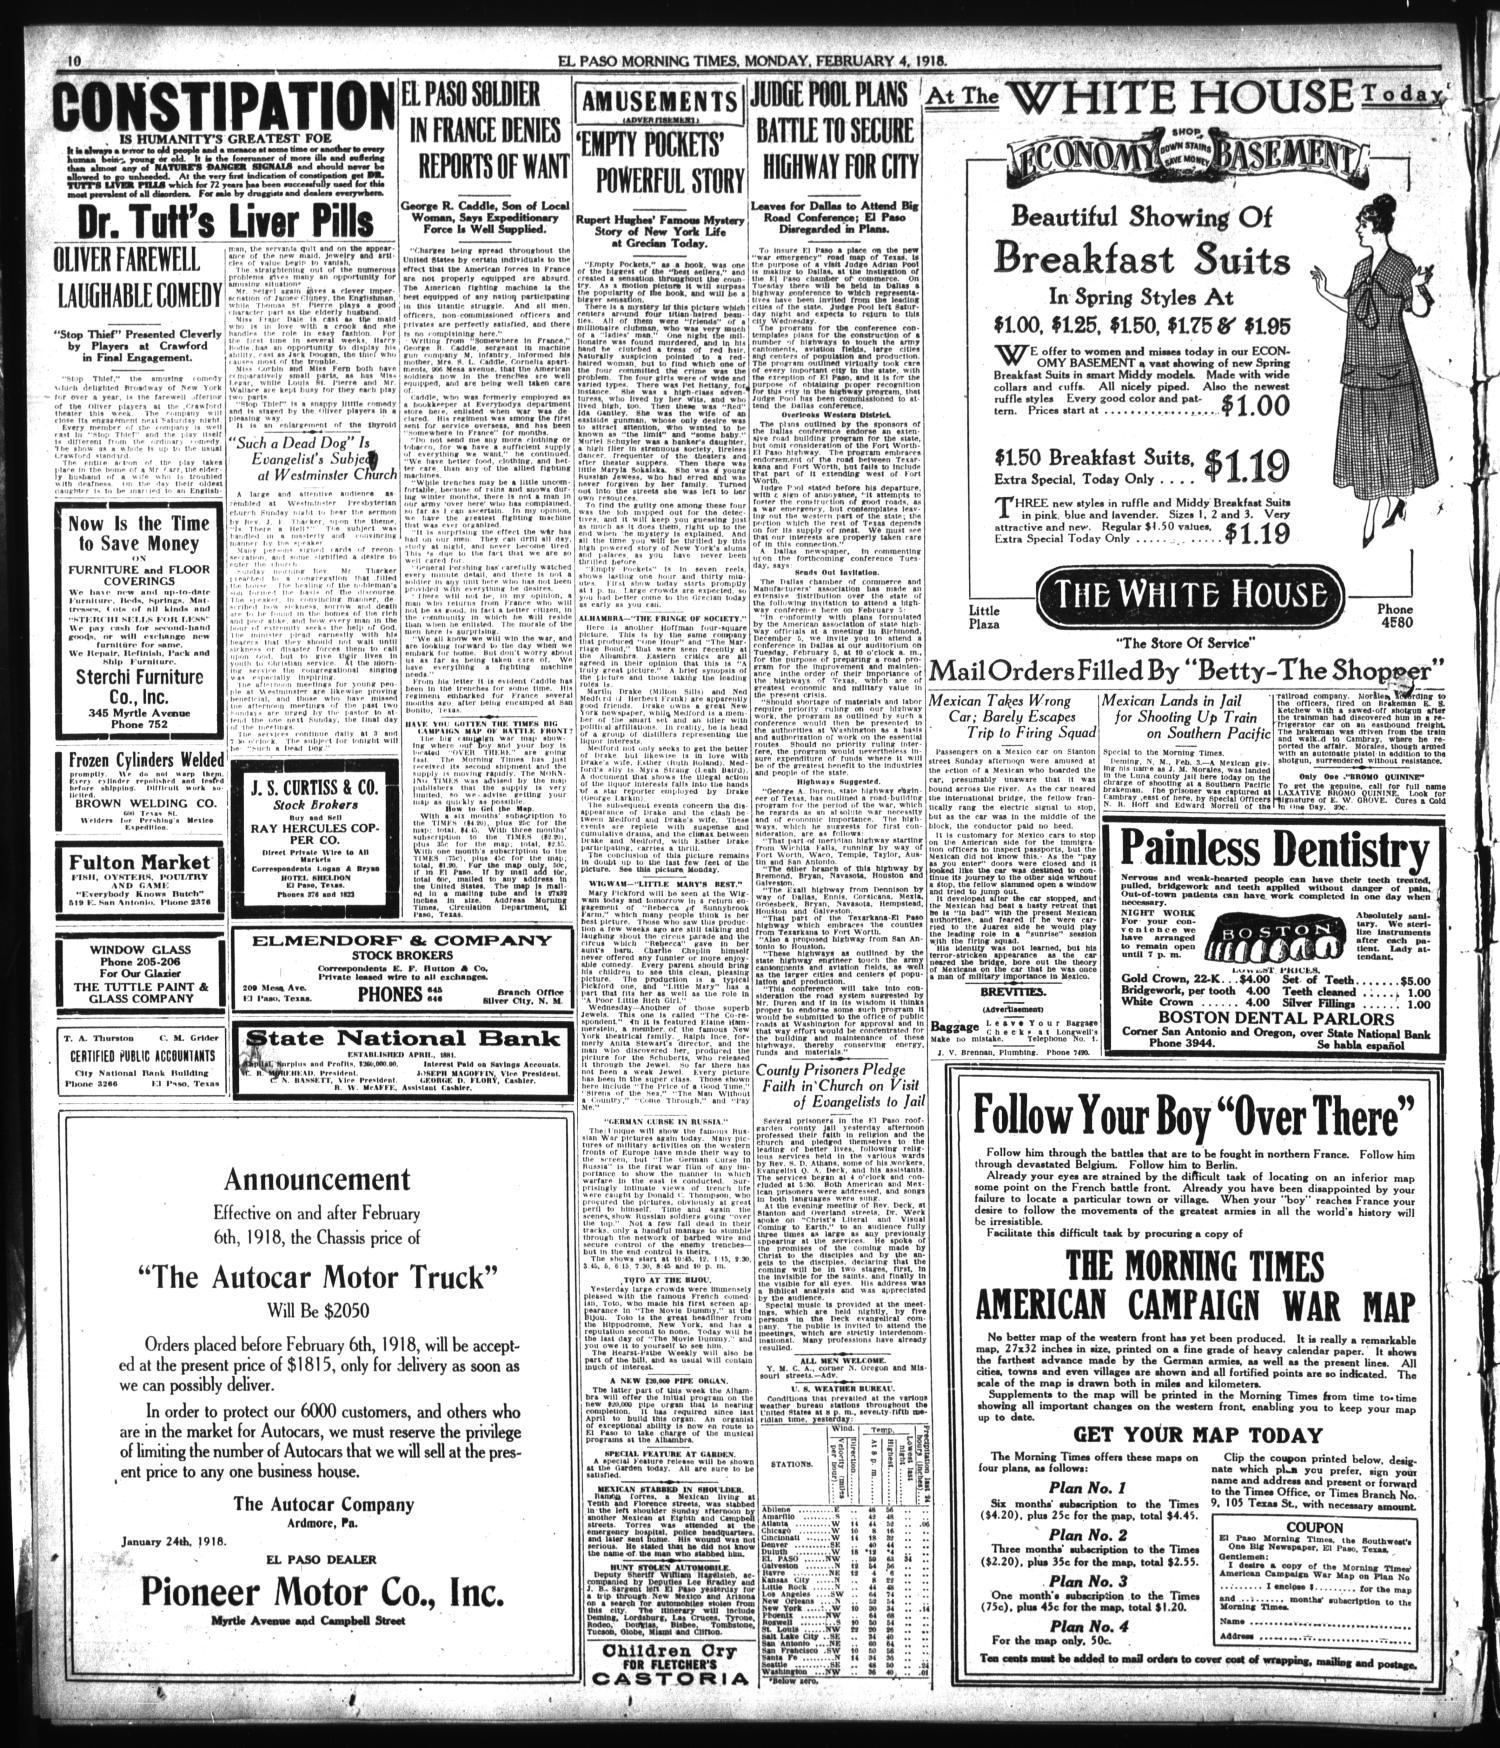 El Paso Morning Times Tex Vol 38th Year Ed 1 Monday Niion Lunar Running Black February 4 1918 Page 10 Of The Portal To Texas History